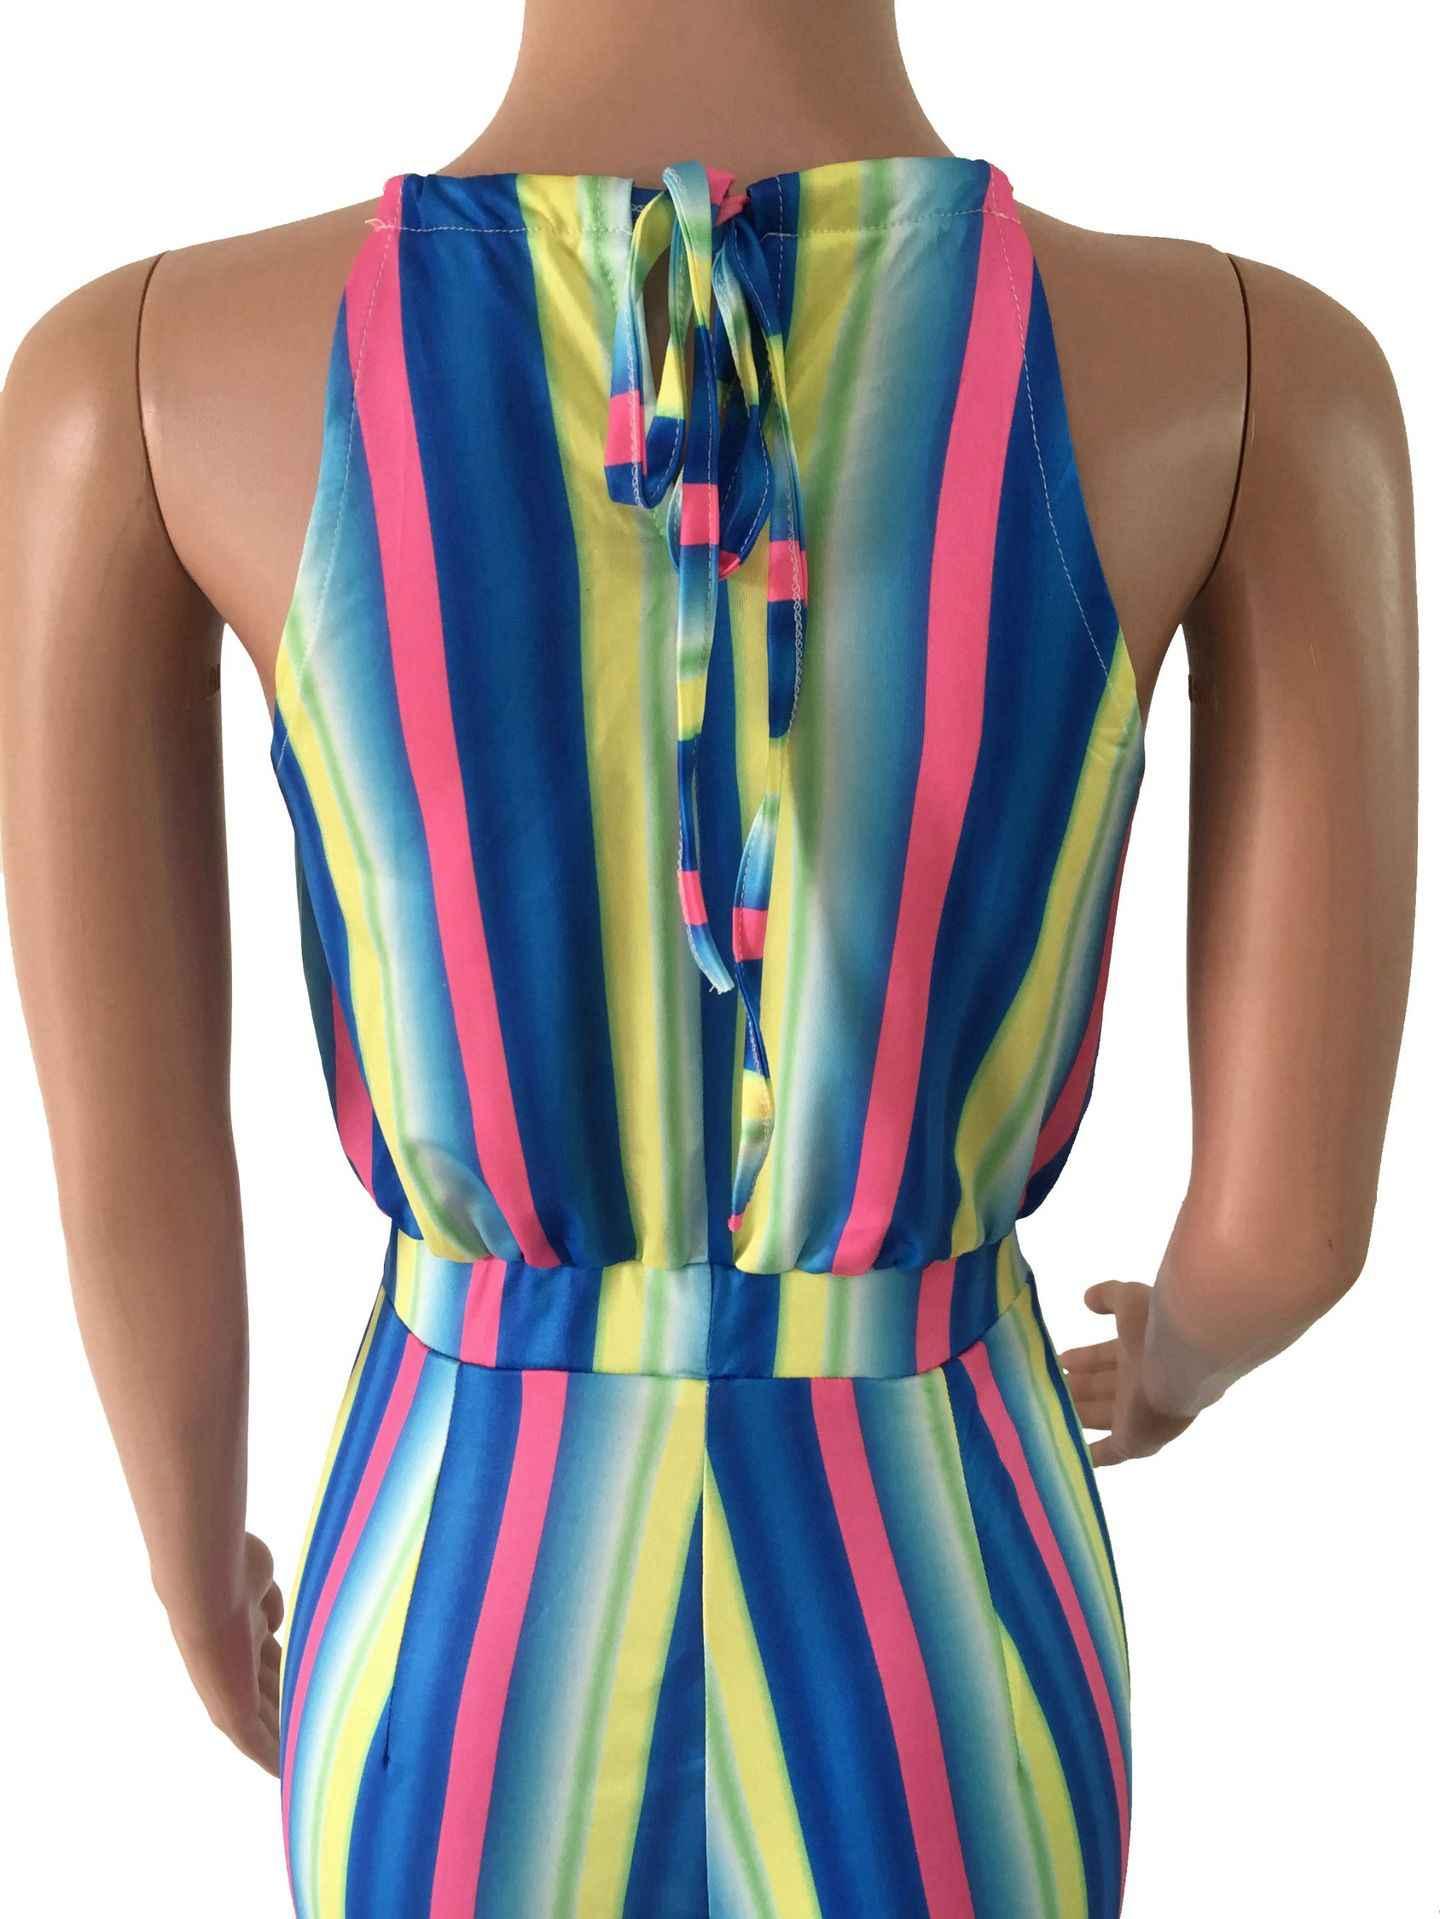 Elegant เซ็กซี่ Halter Rompers ชุดสตรีแขนกุด Rainbow สบายๆขากว้าง Jumpsuits Leotard โดยรวมแฟชั่น Nova ผู้หญิง